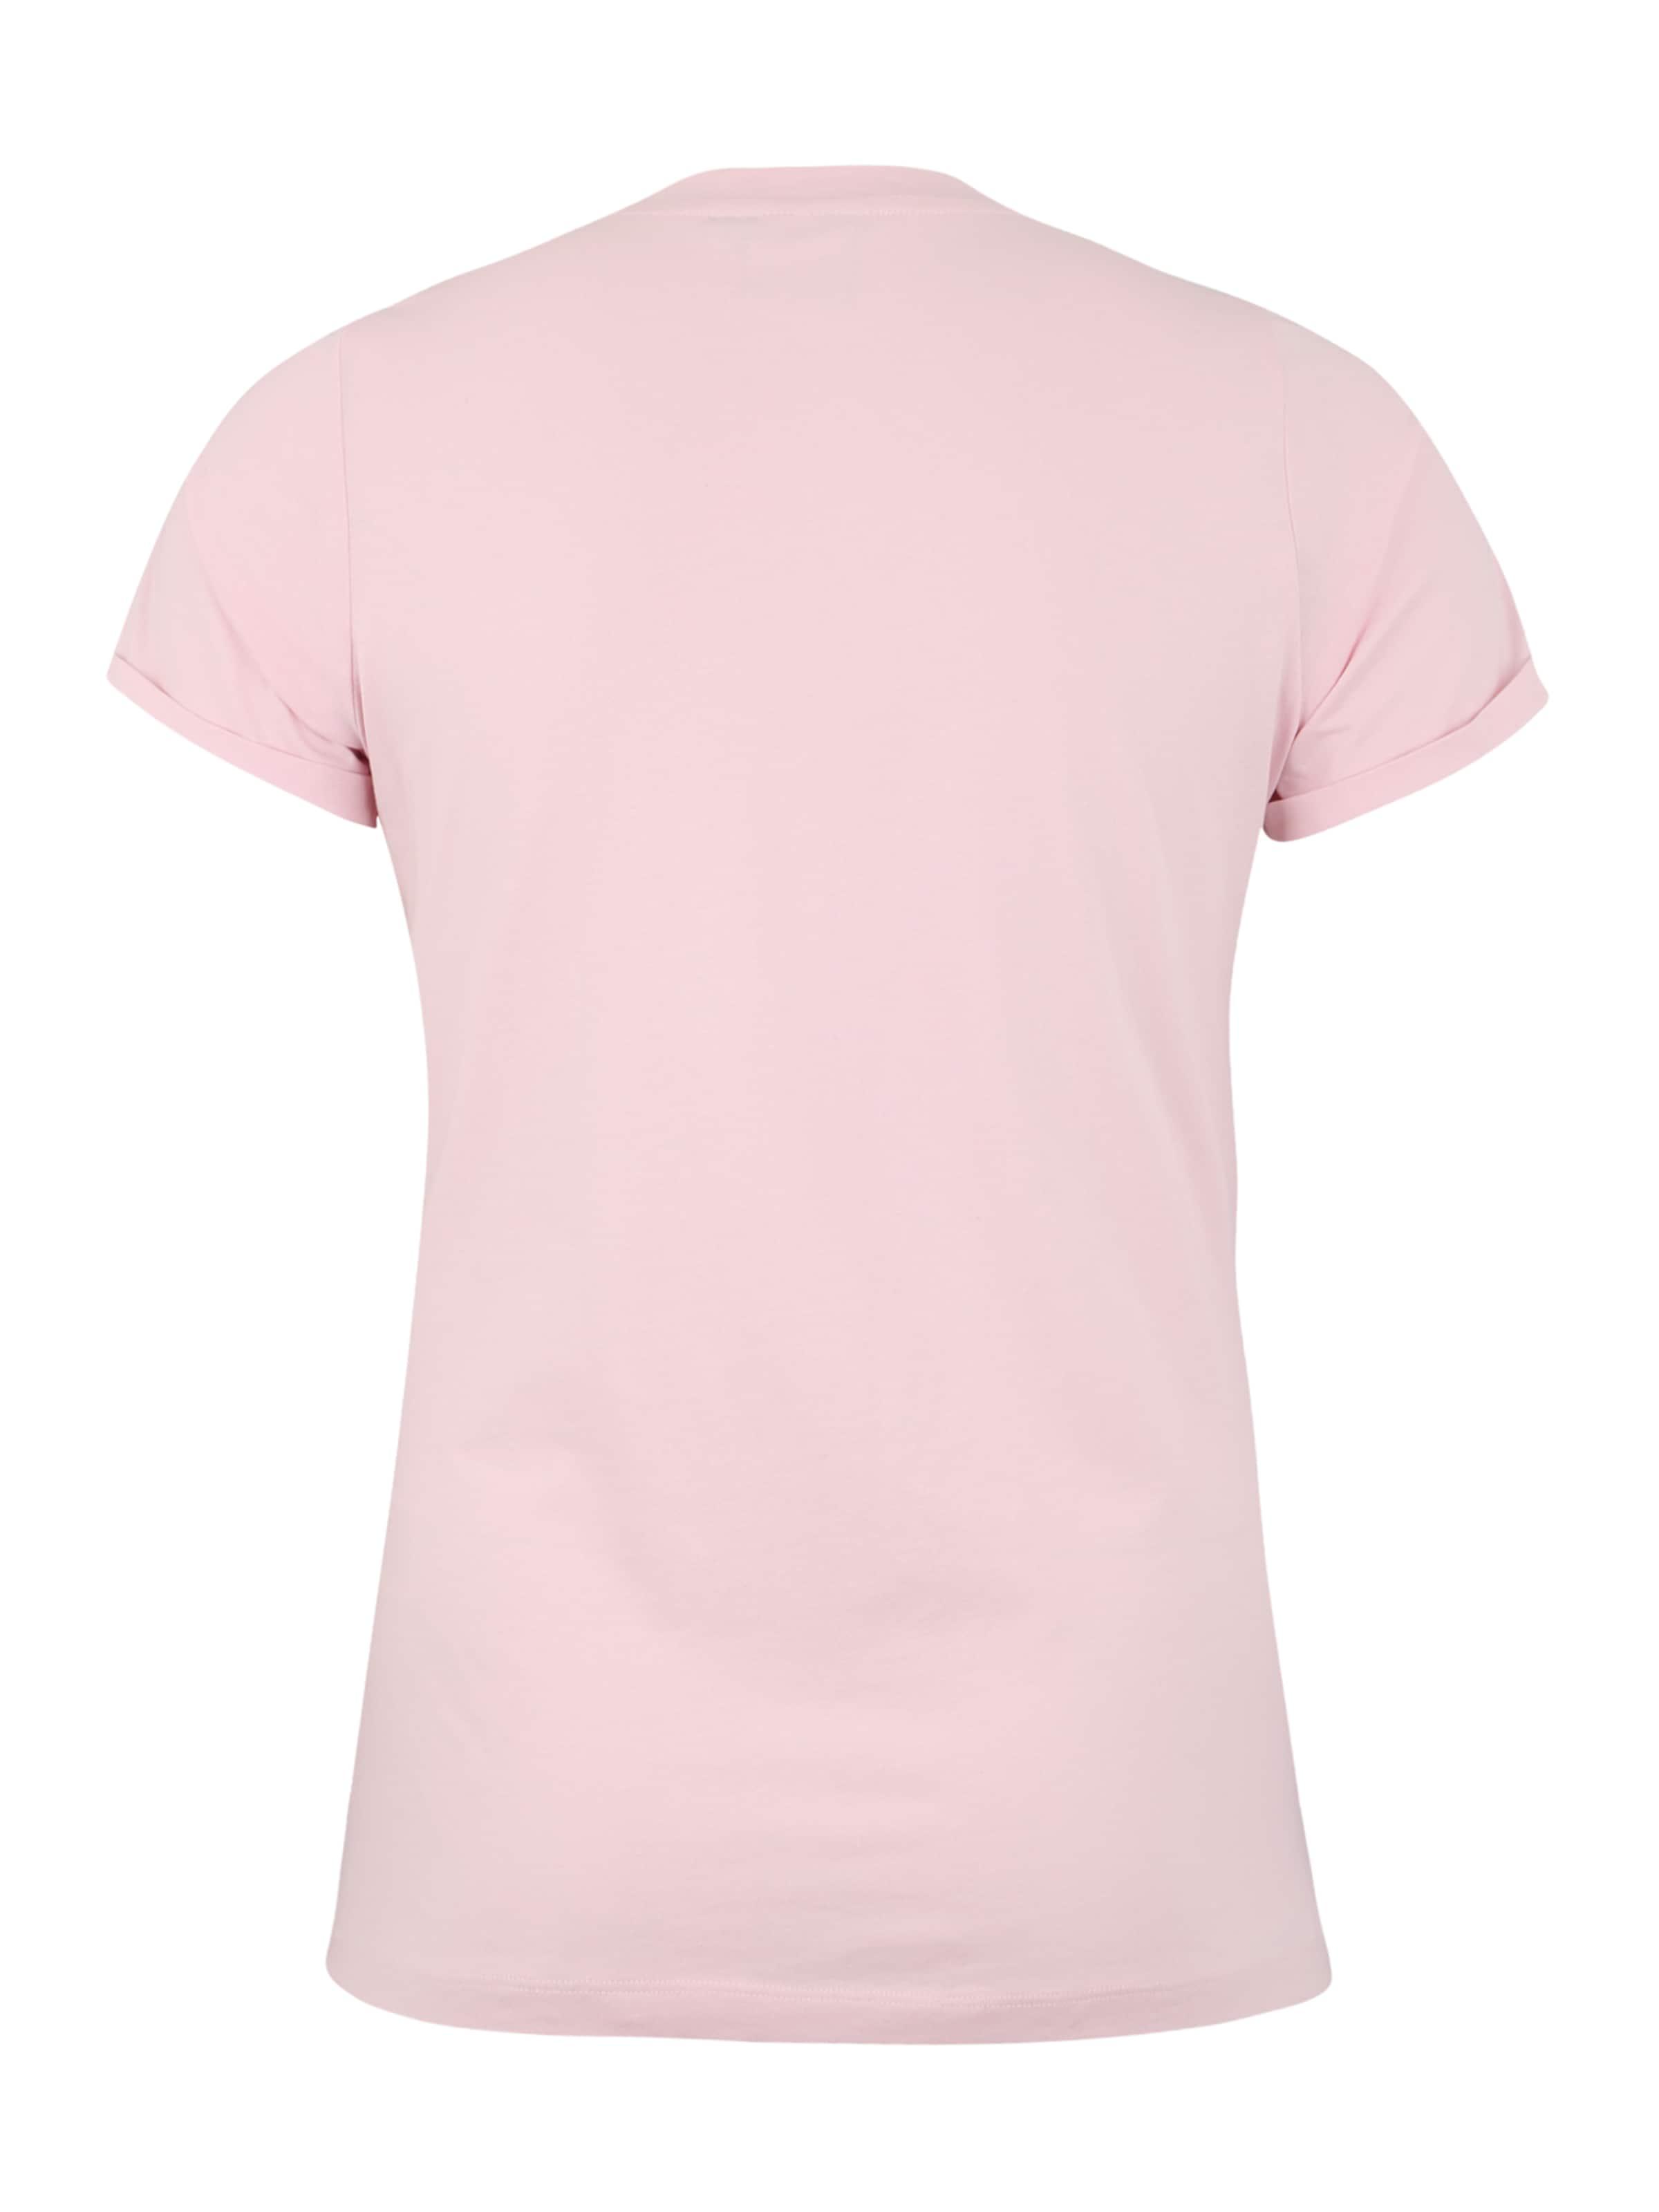 En Roxy' 'jrravas Junarose T shirt Rose edxCBo